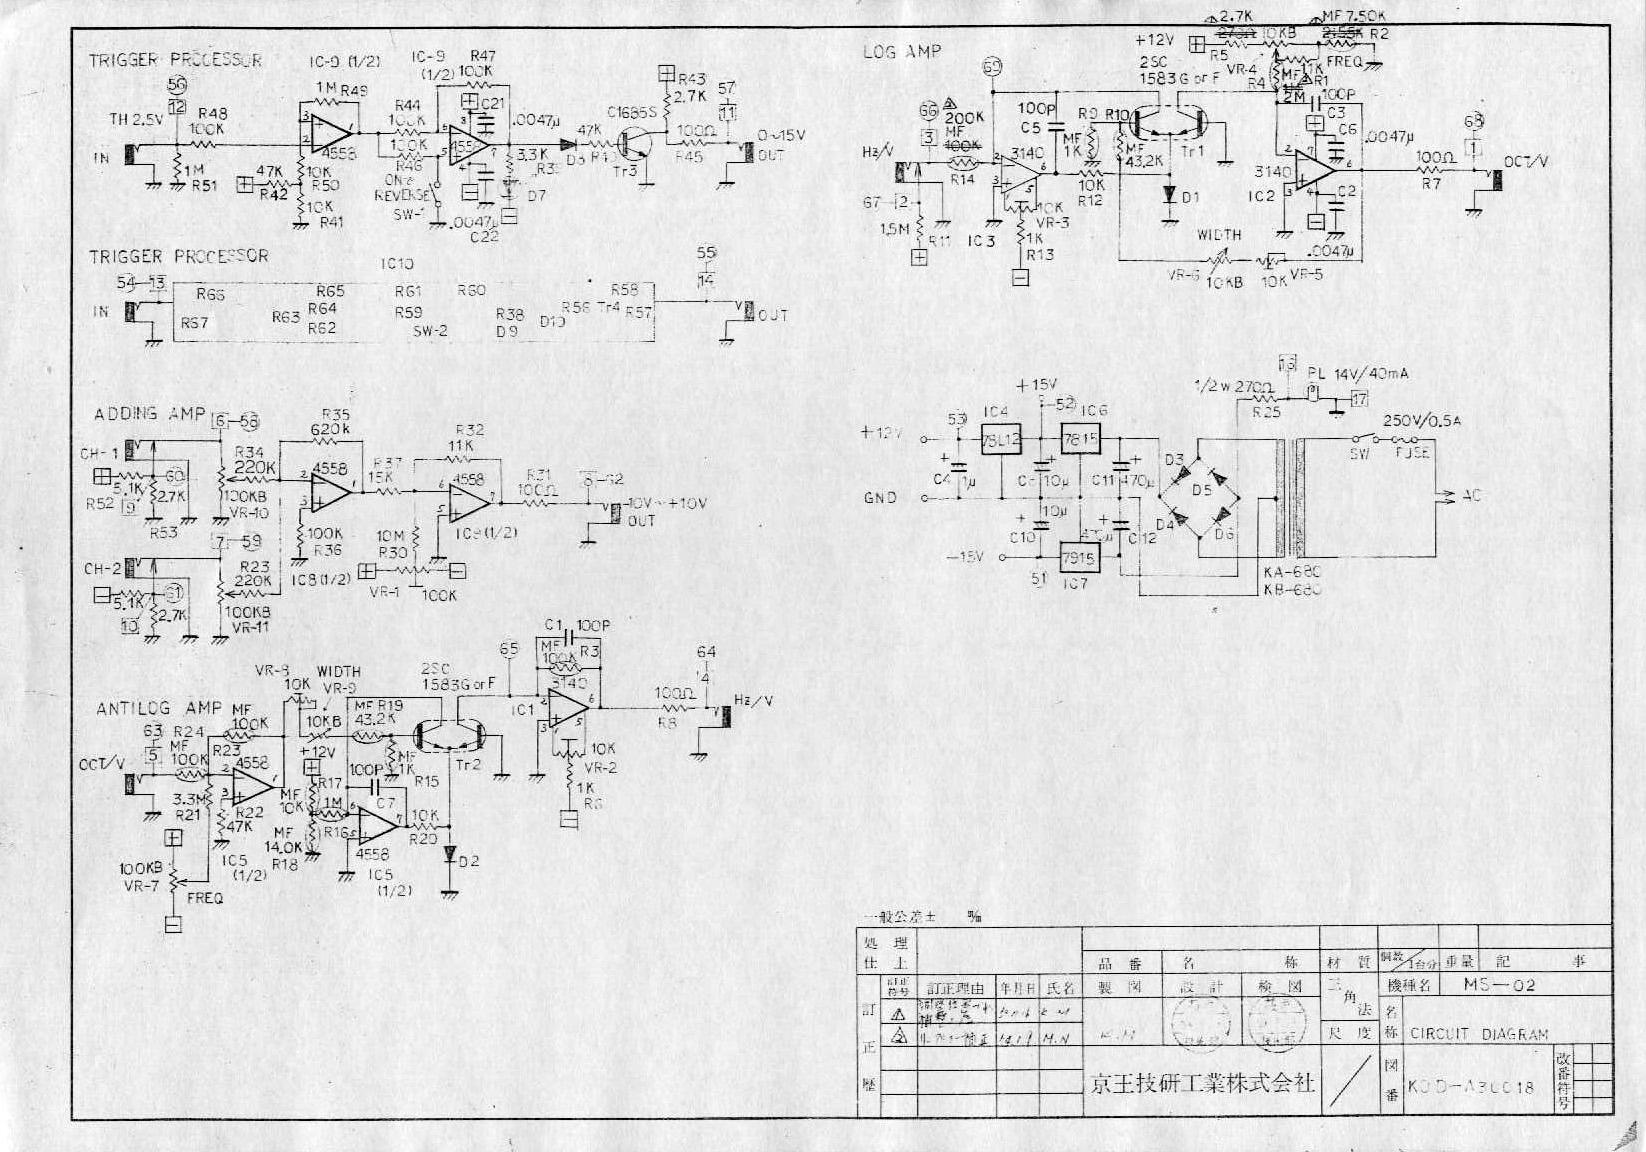 Cbz Service Manuals Spark Plug Of 1966 Oldsmobile 54 Through 86 Seriescar Wiring Diagram Array Index Old Flat Rh Fdiskc Com